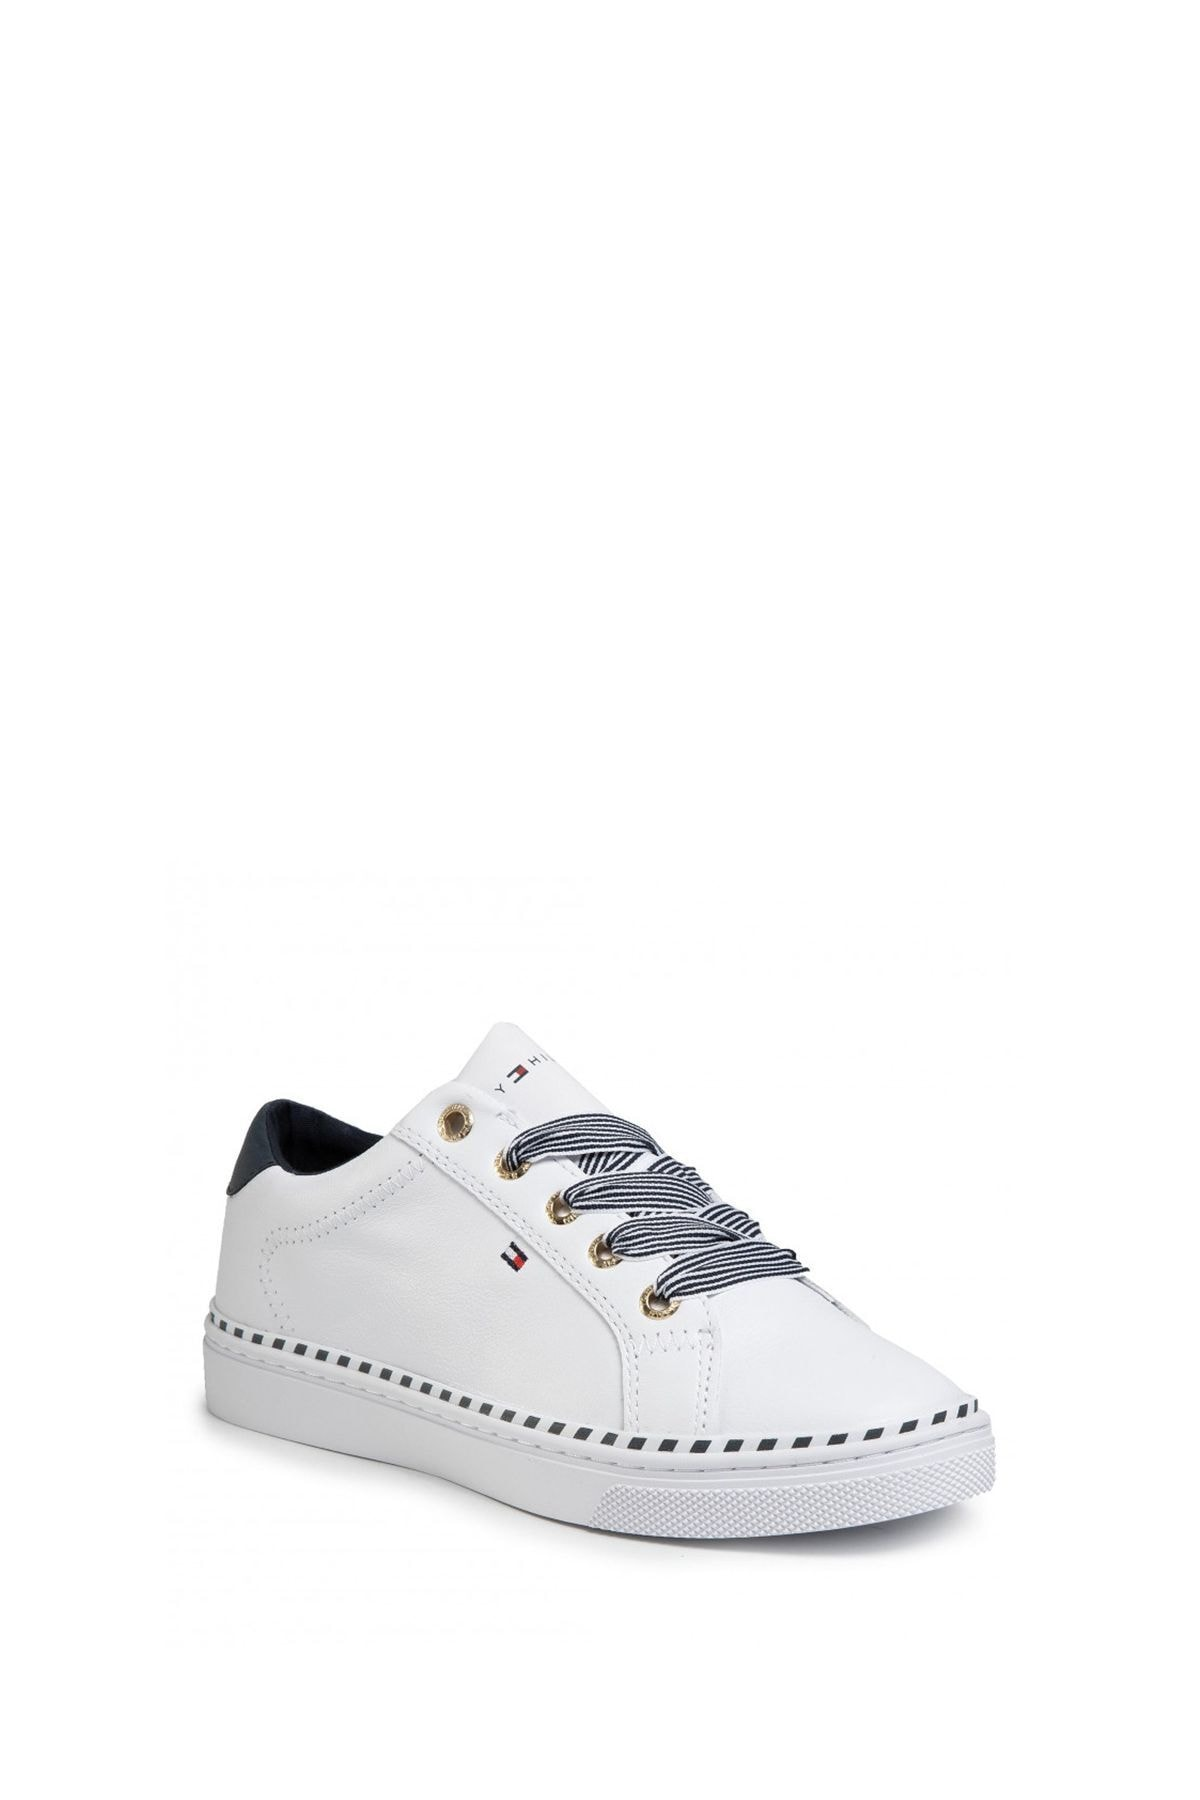 Tommy Hilfiger Kadın Beyaz Sneaker Fw0fw04689 1